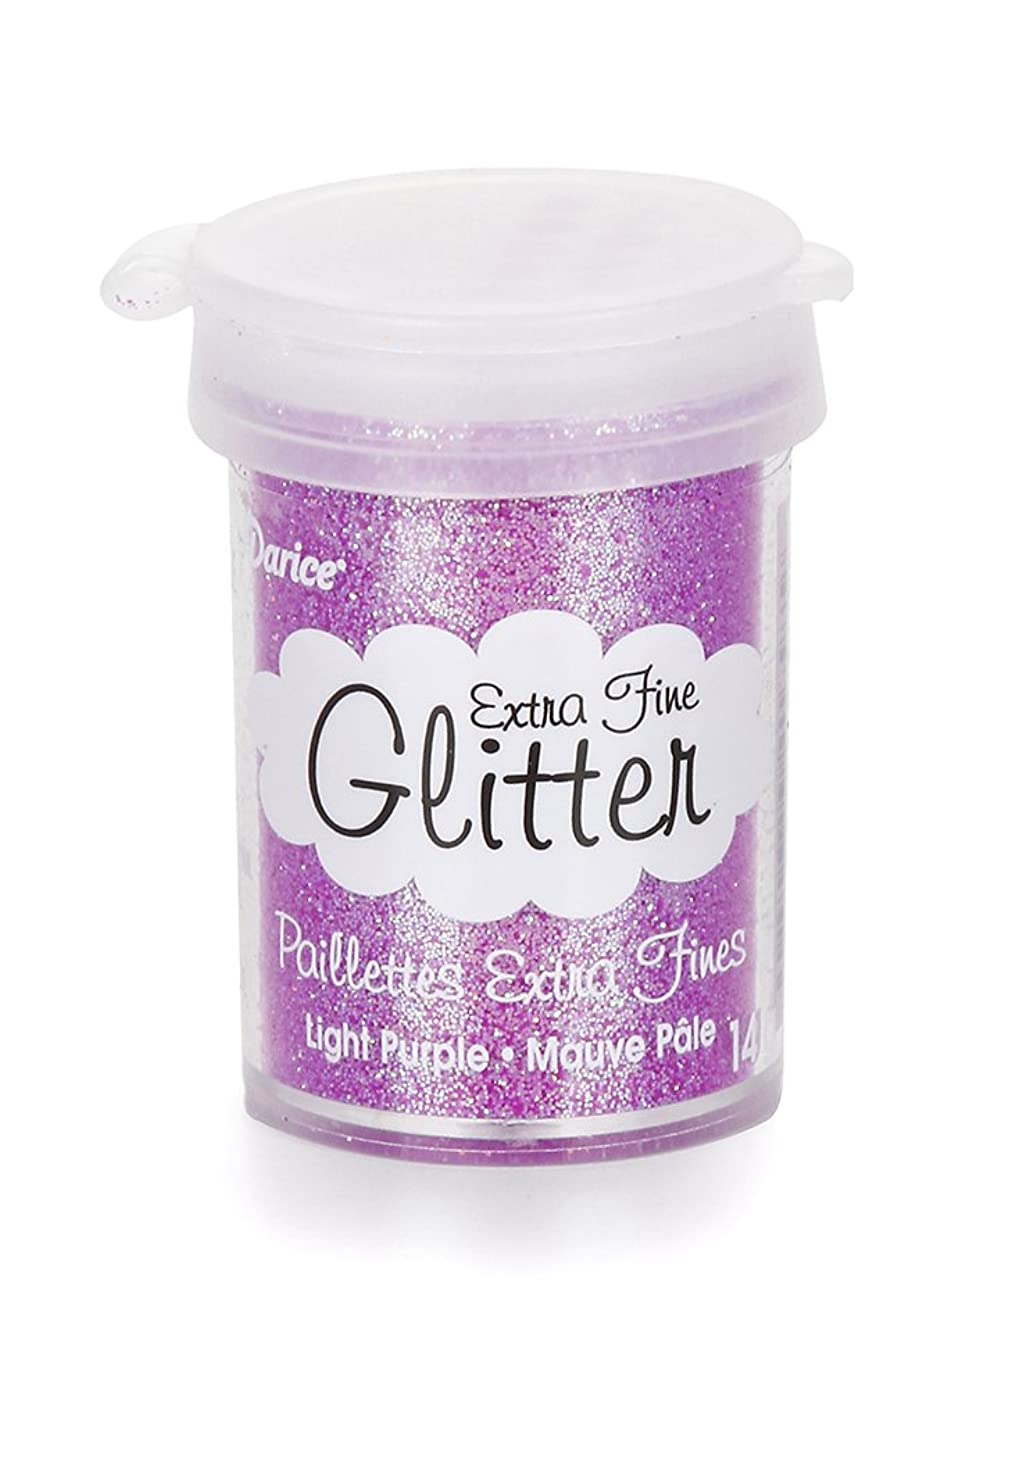 Darice Extra Fine Glitter - Light Purple - 15 Grams